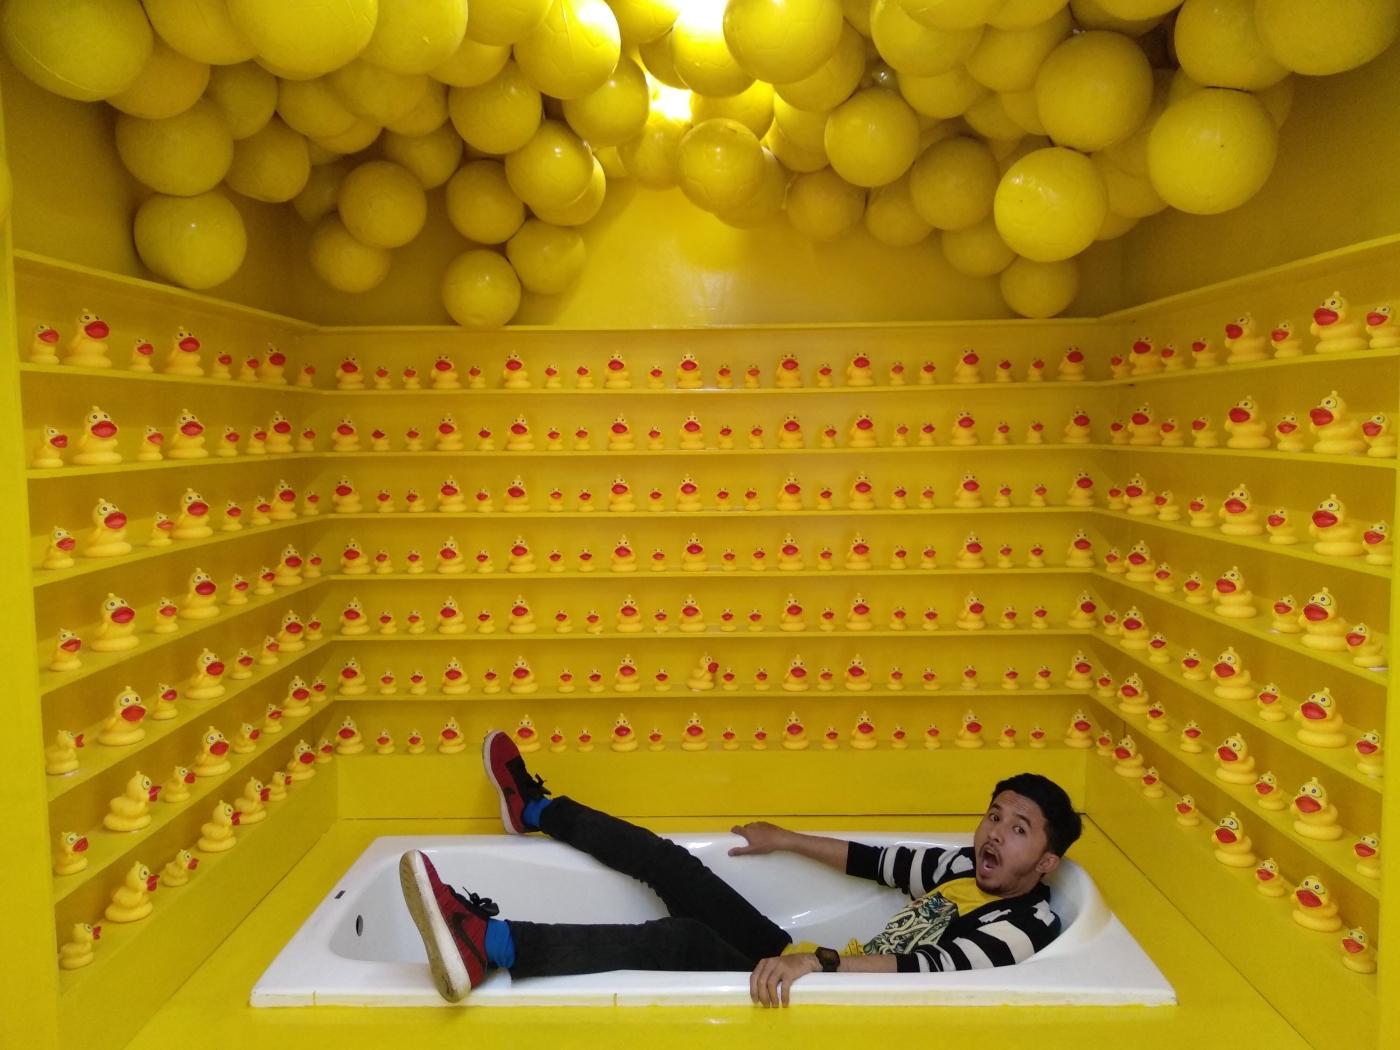 Centrum Million Balls (Wisata Selfie dan Kolam Mandi Bola Terbesar